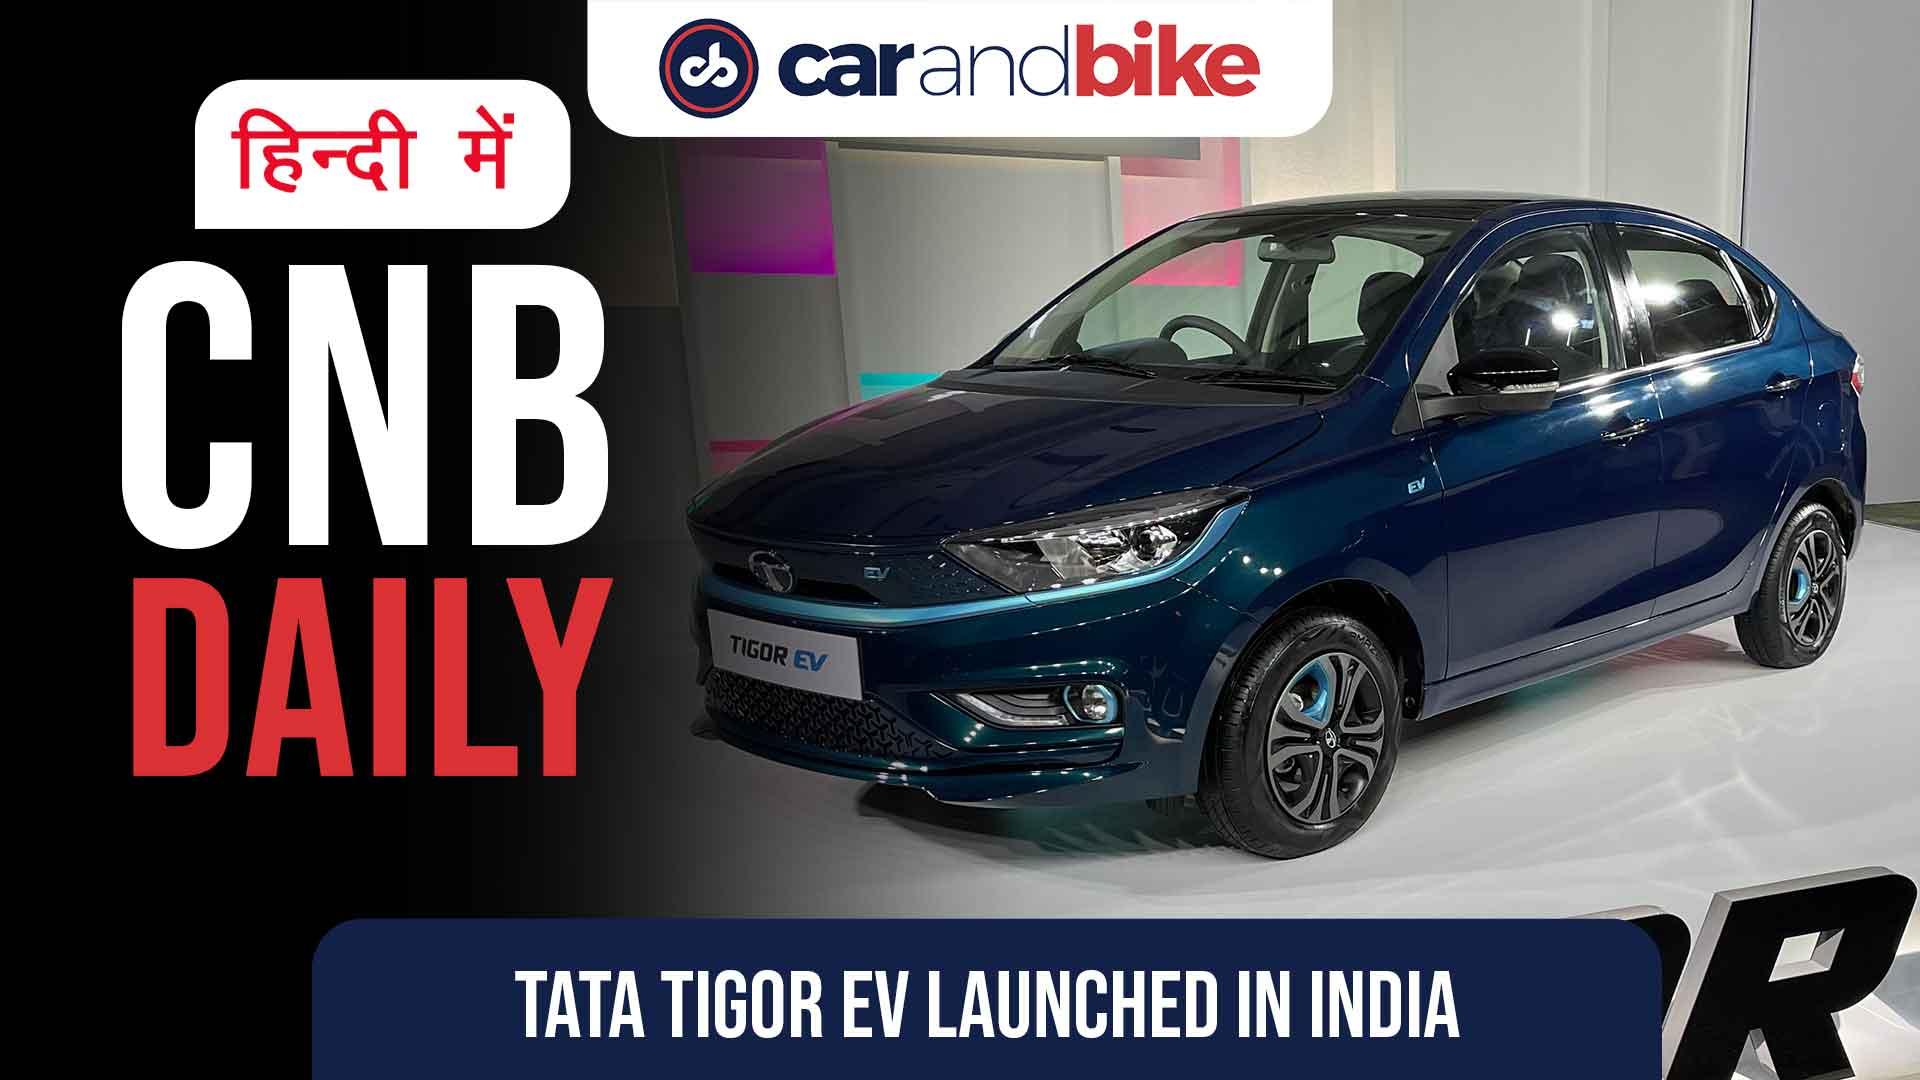 TATA TIGOR EV भारत में लॉन्च